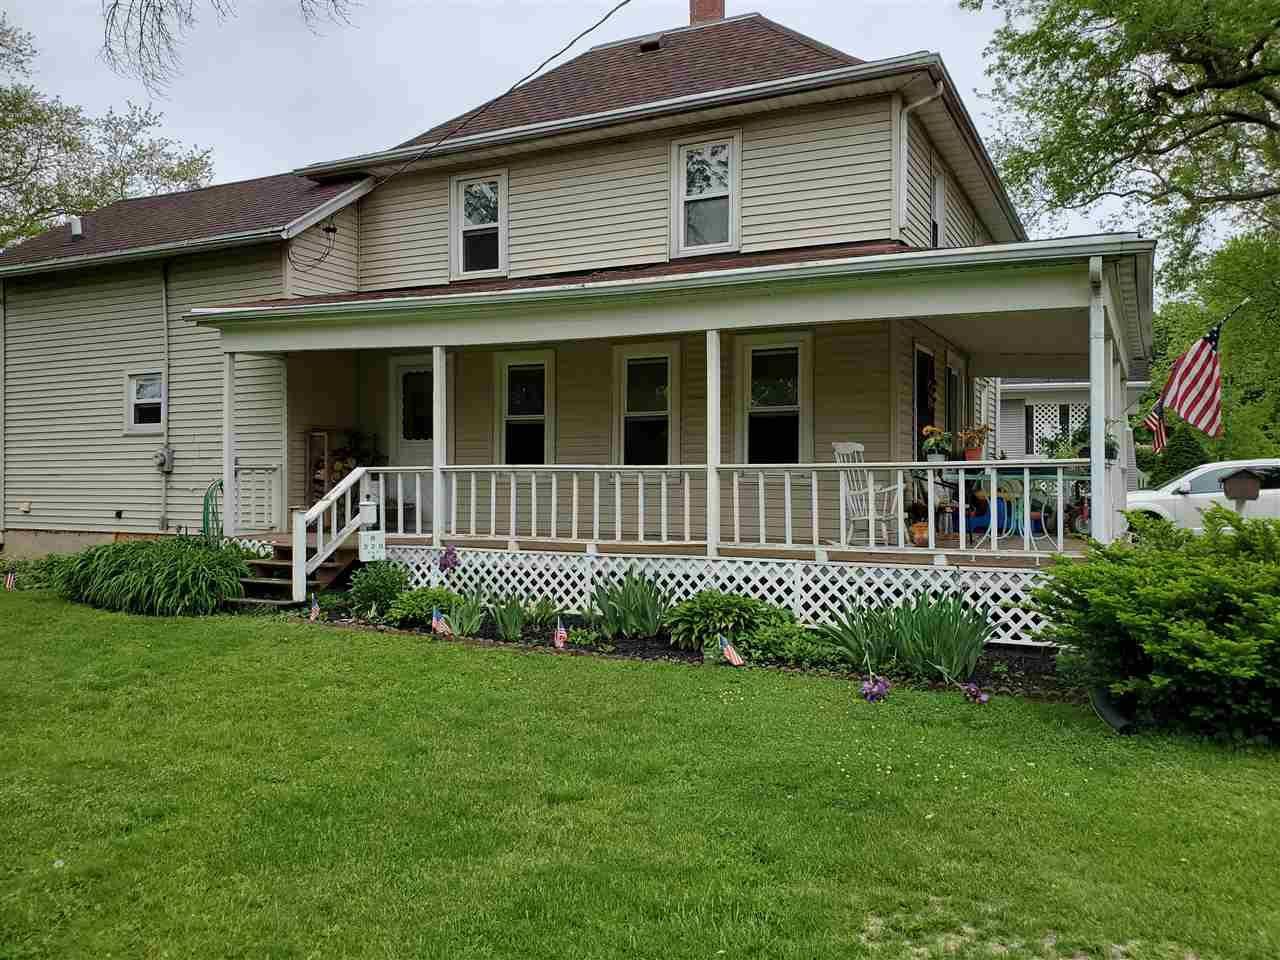 f_1911593_02 Real Estate in 53534 zip code